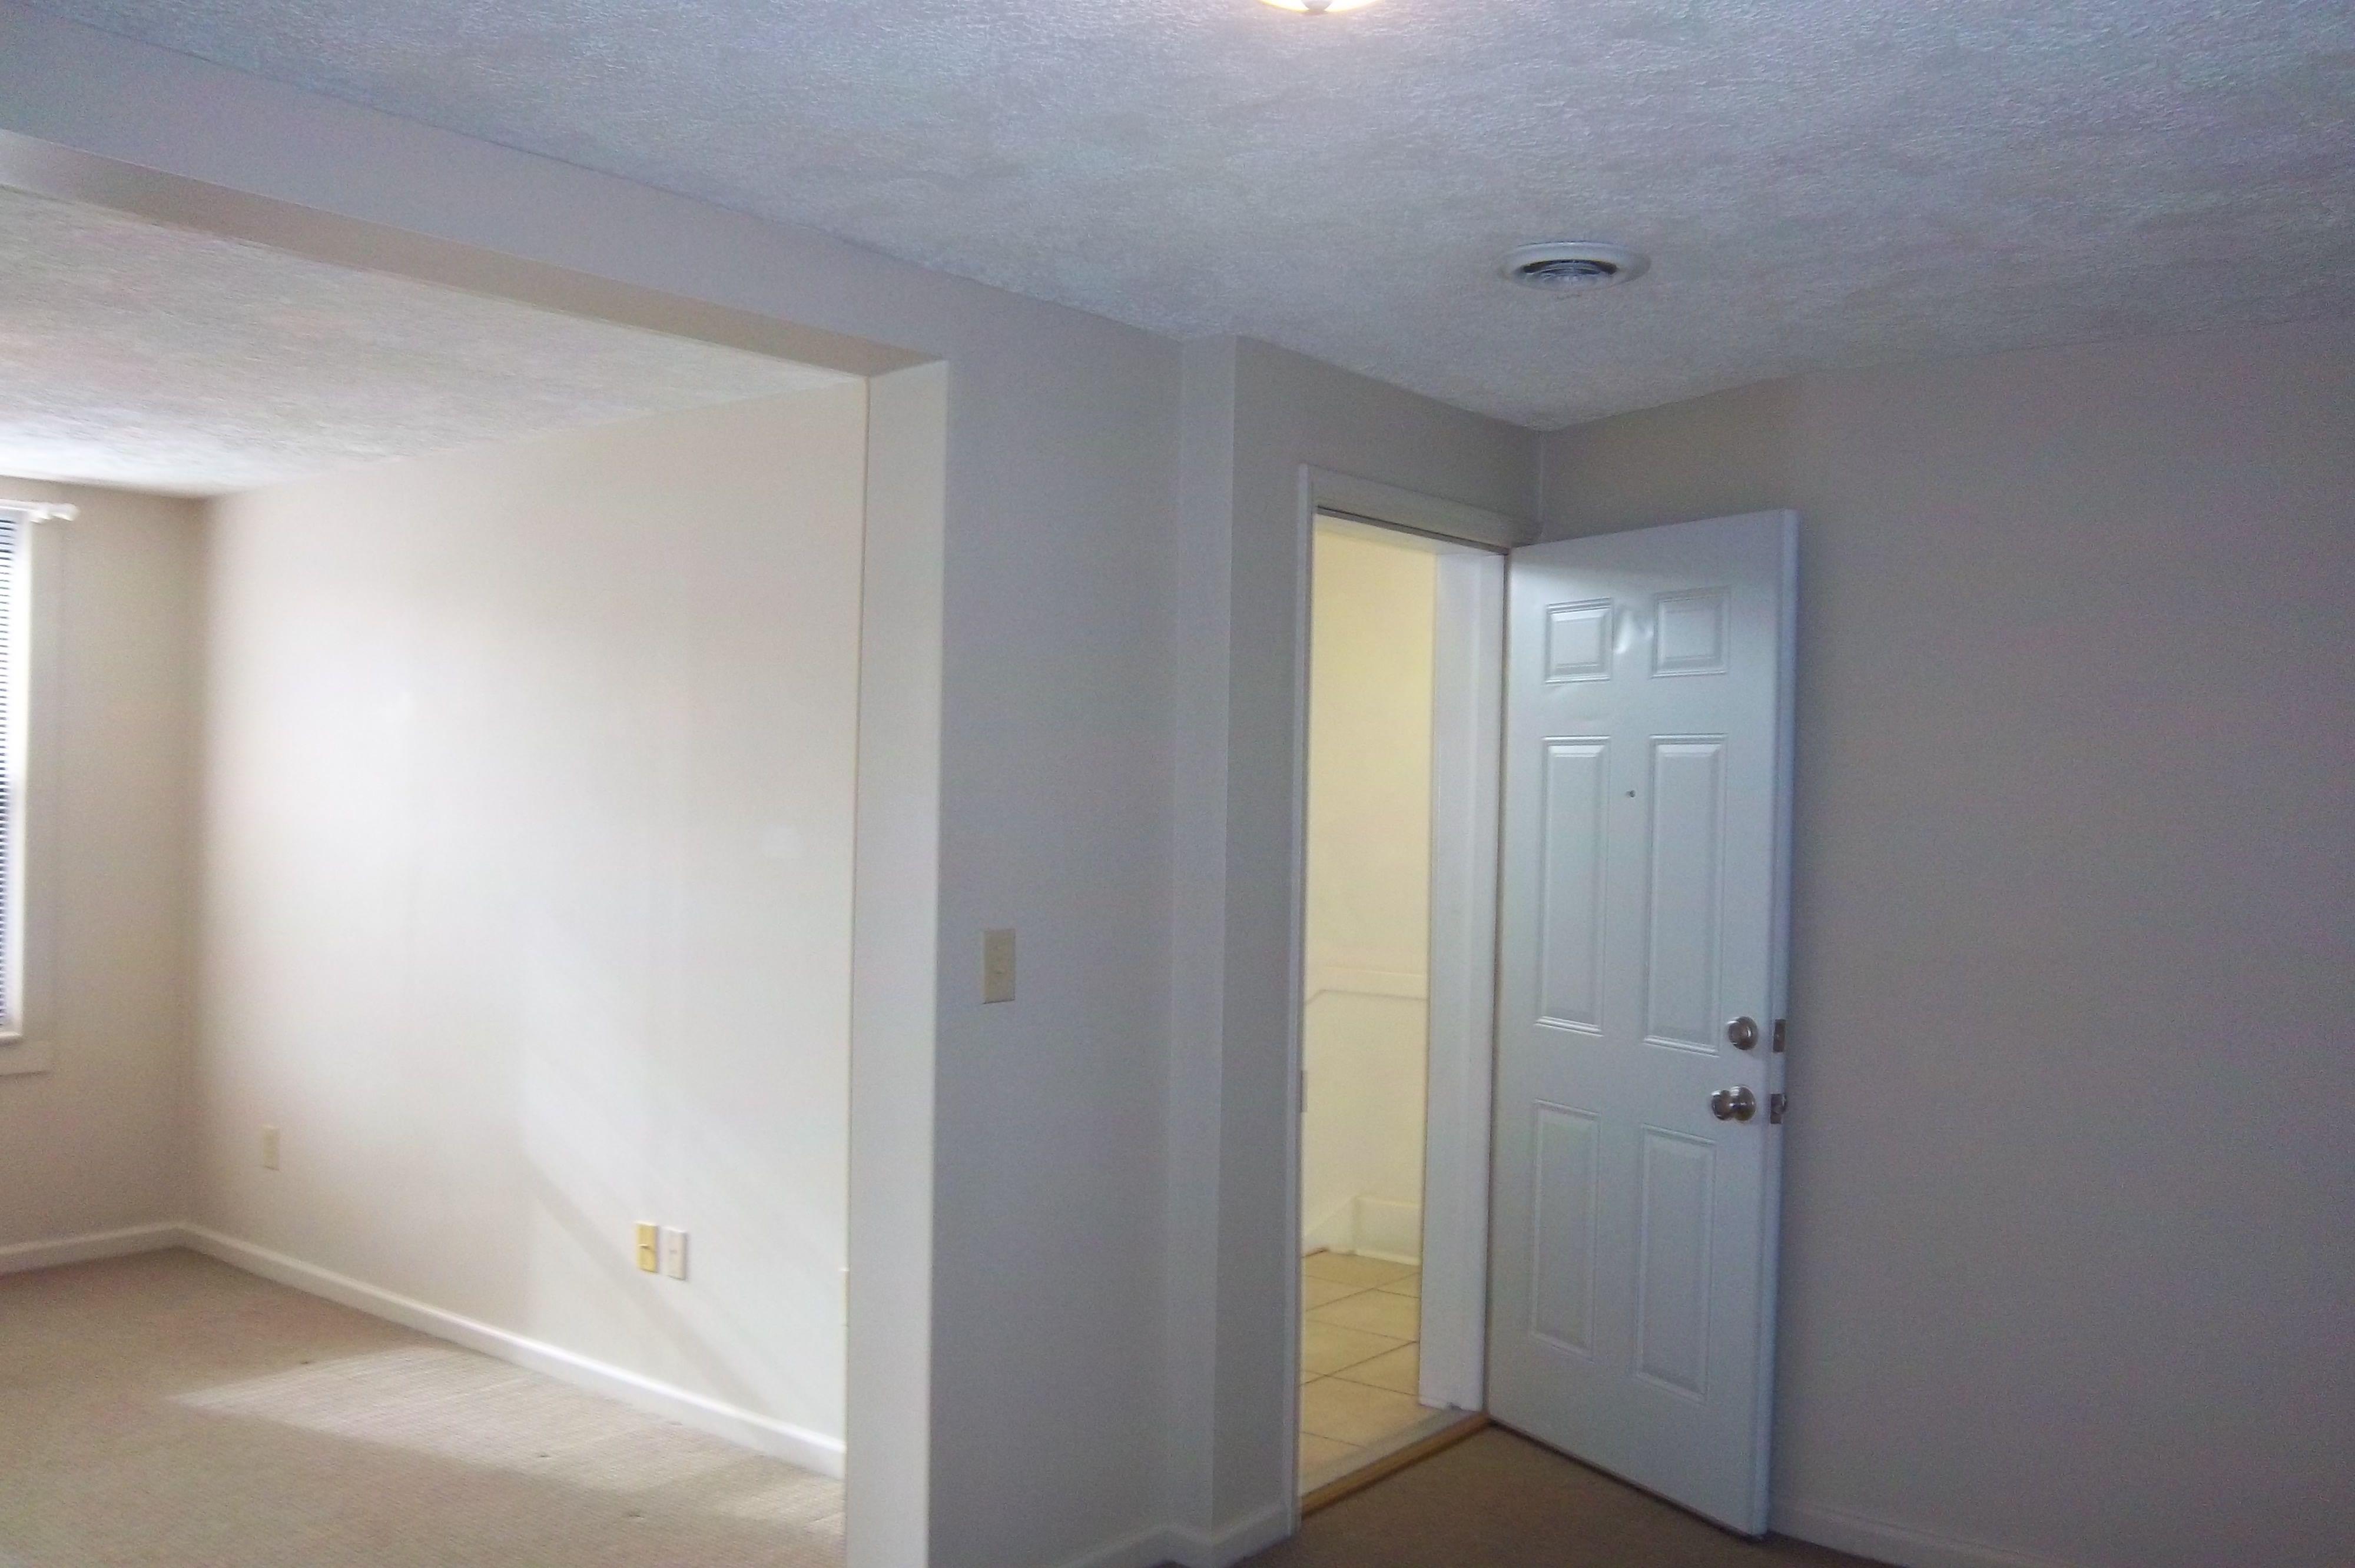 105 E Third Street - Apt 4 (Image - 1)